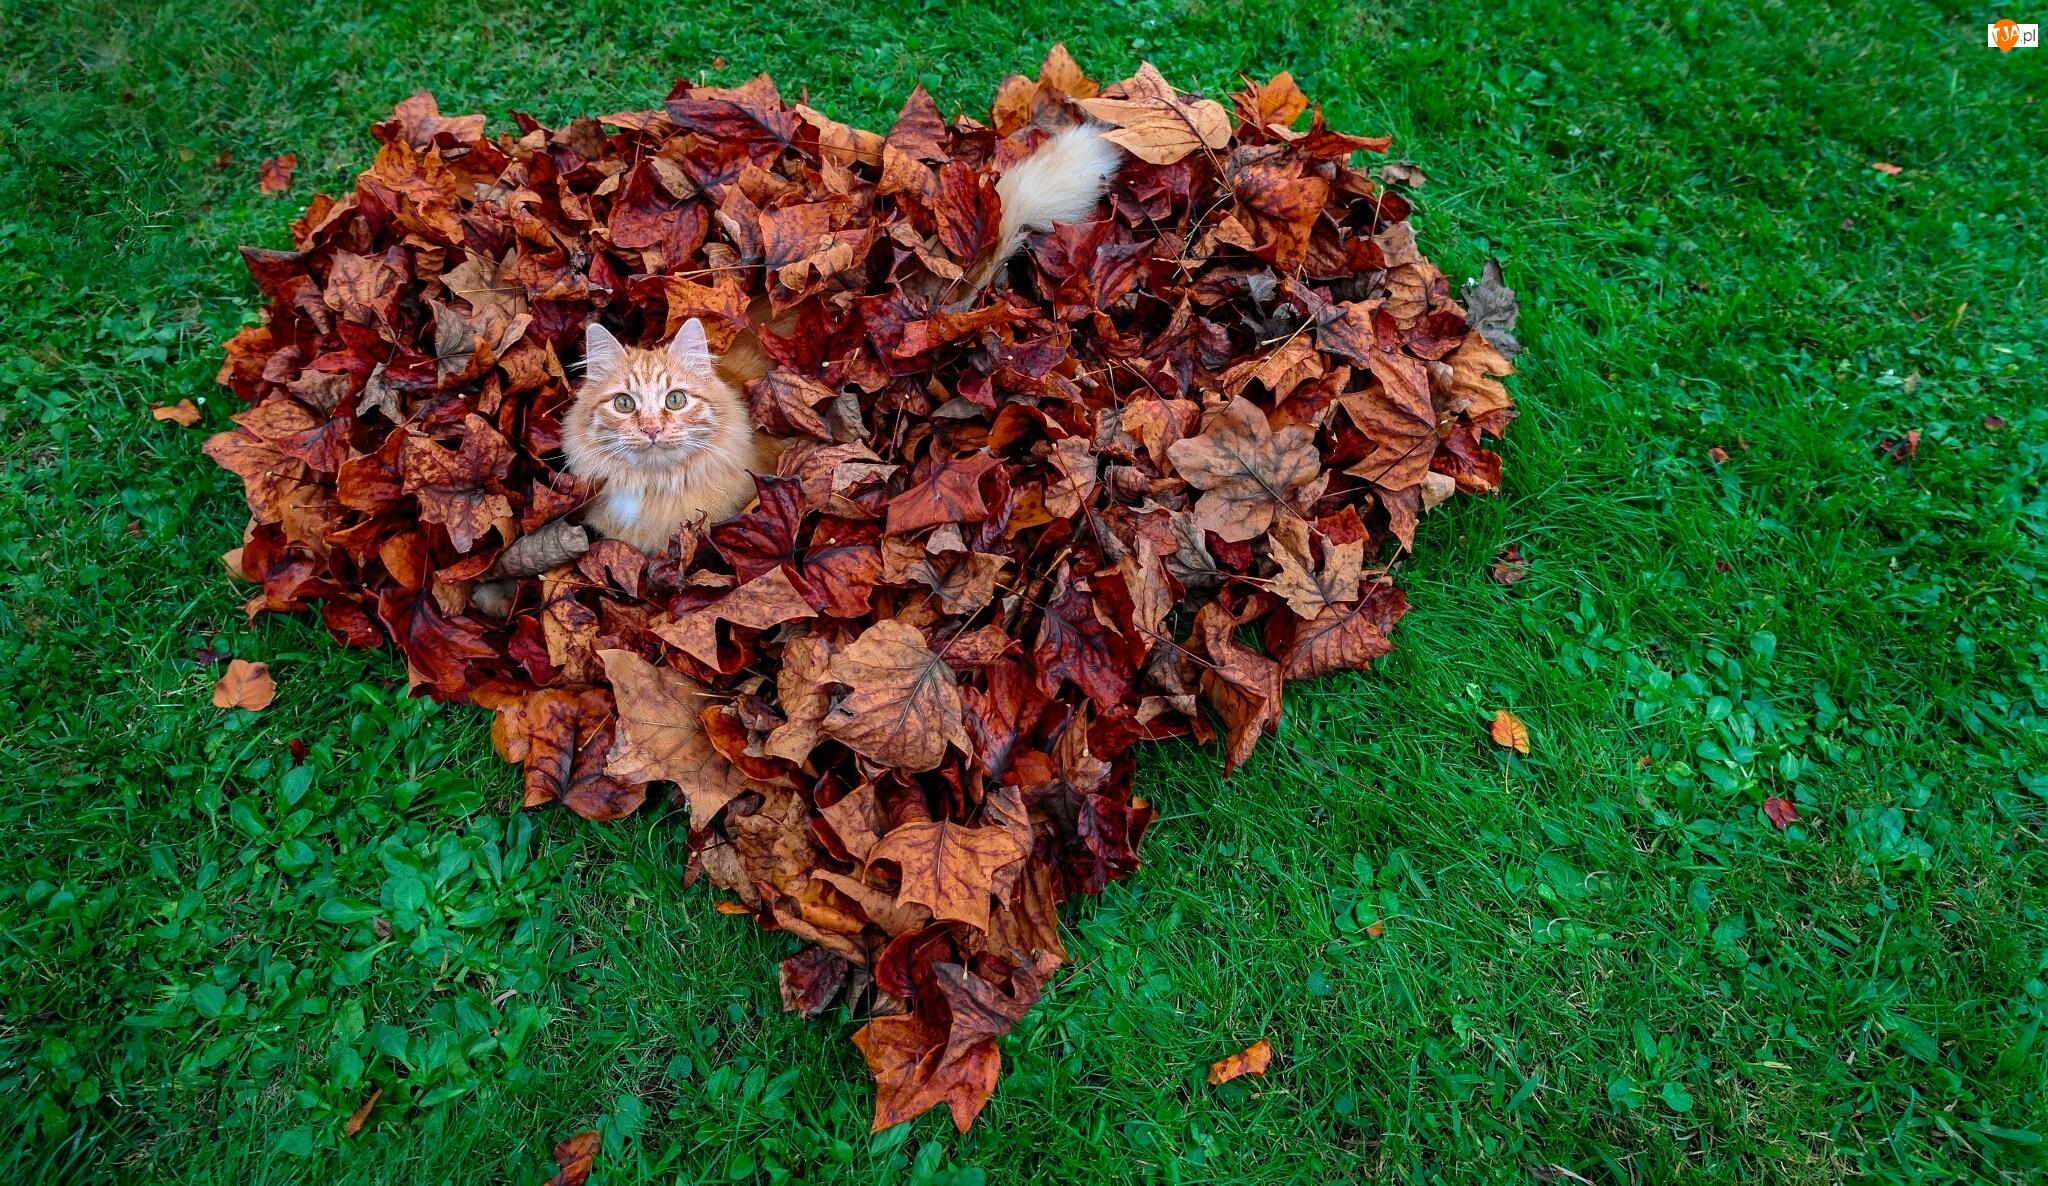 Kot, Liście, Serce